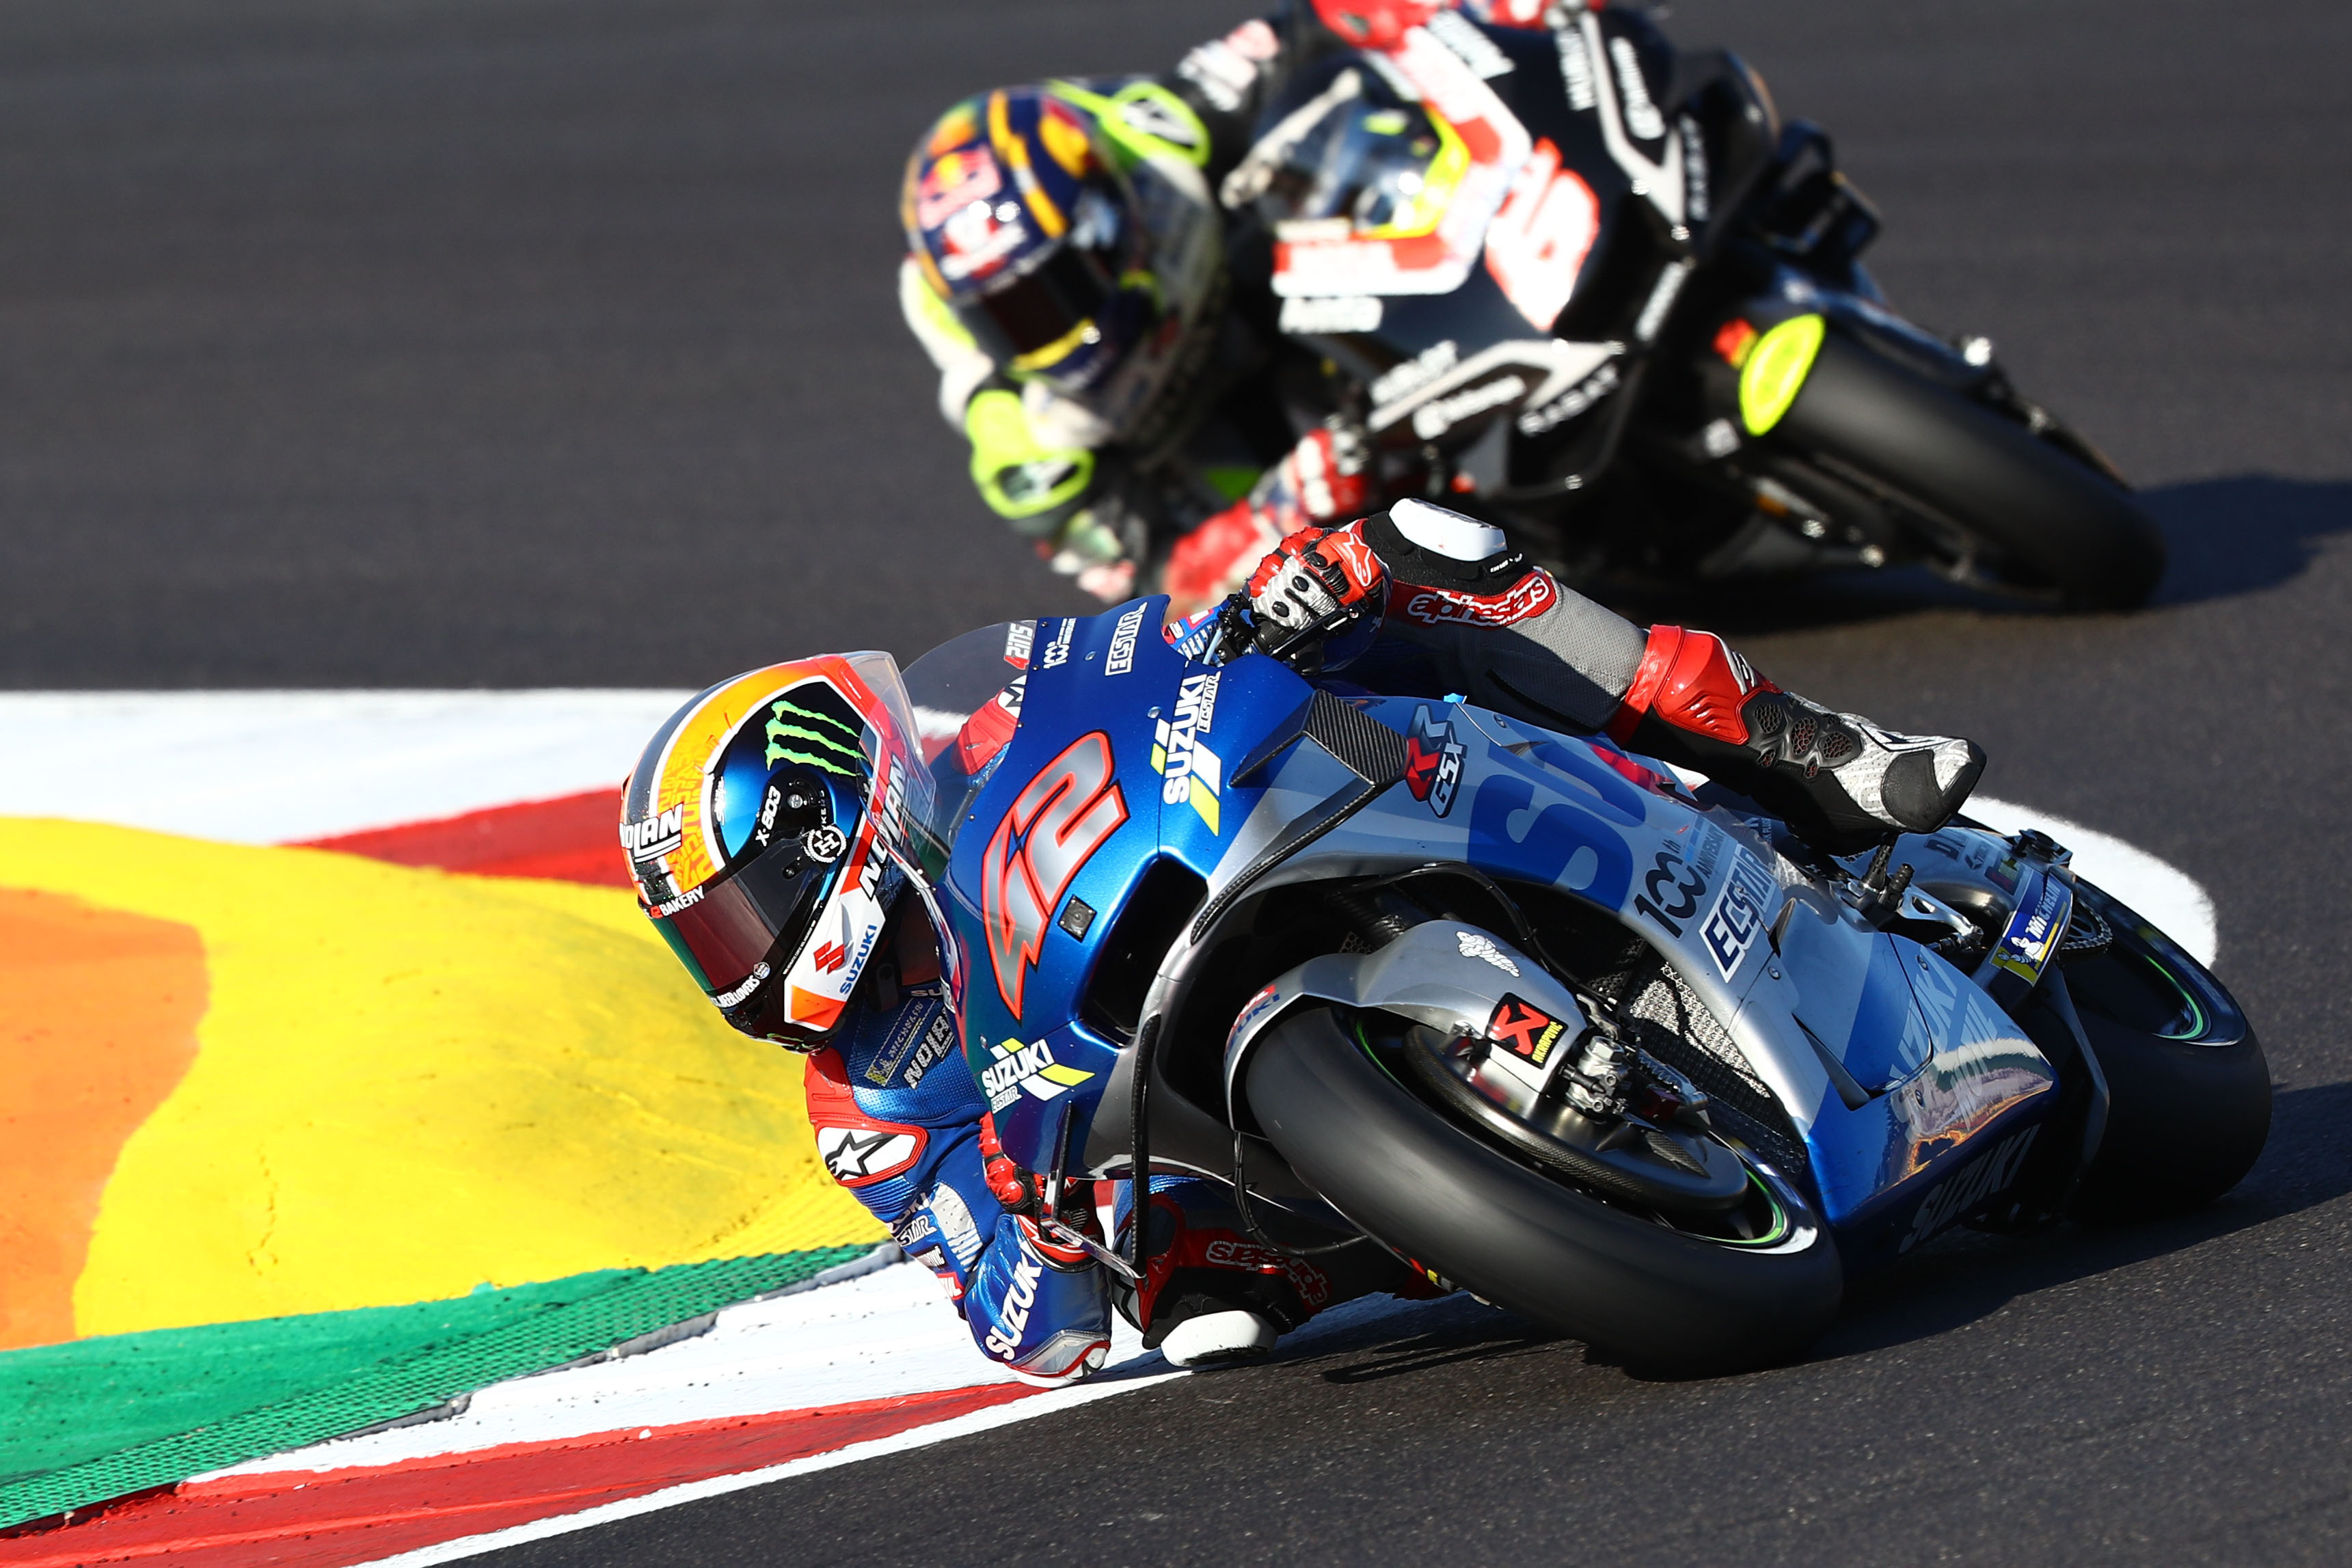 Alex Rins and Johann Zarco, Portimao MotoGP